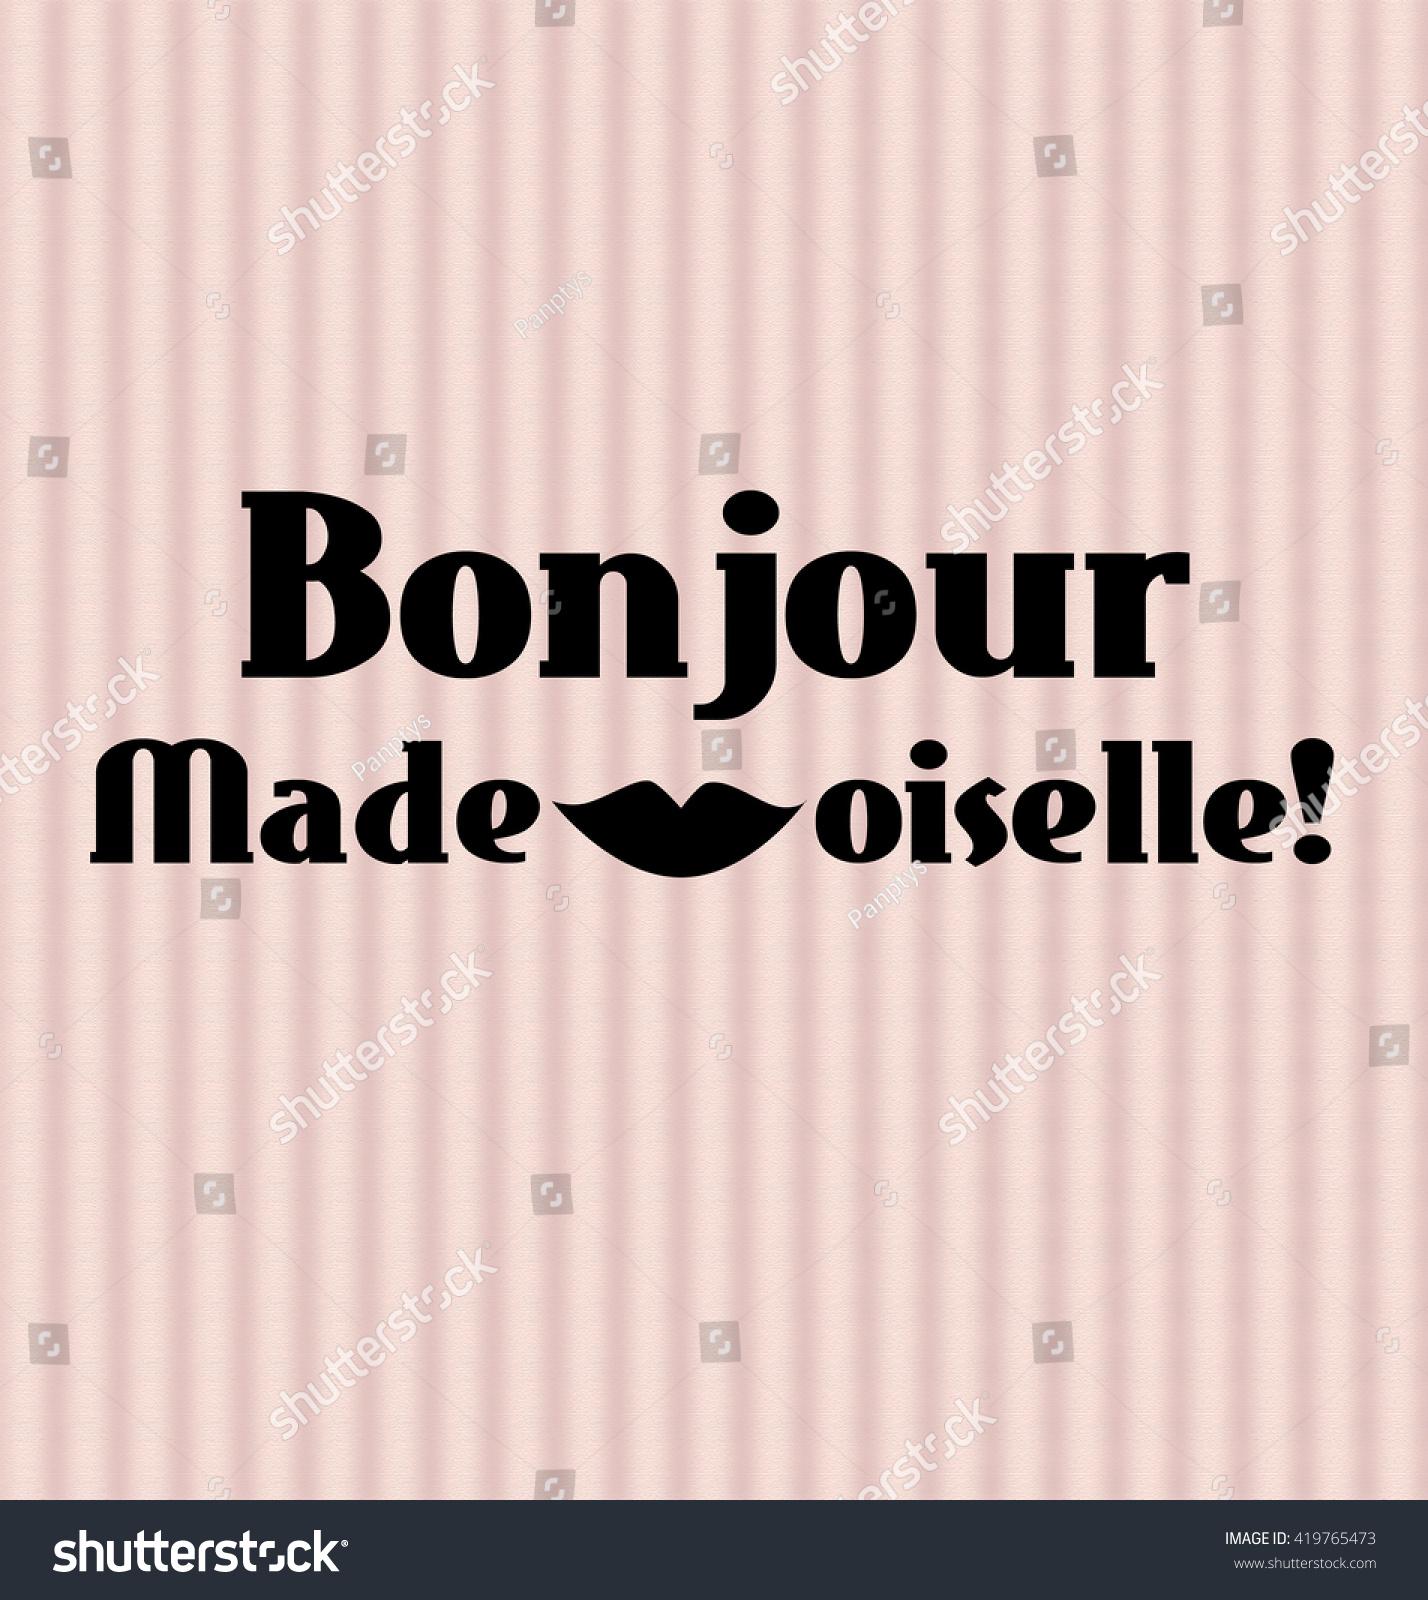 Good Morning Gentlemen In French : Inspirational good morning poster french elegant stock